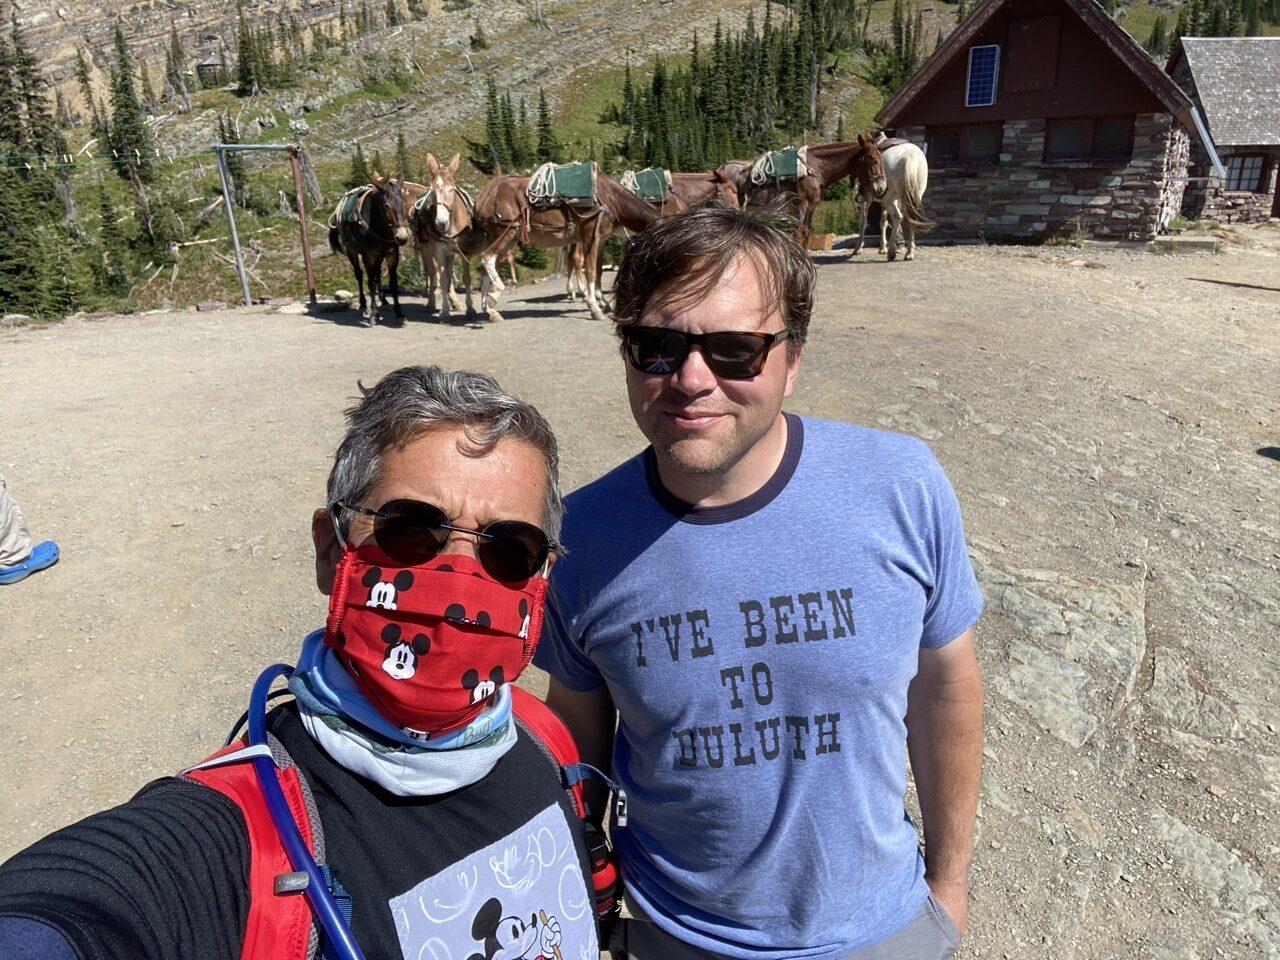 Jeff noel and Jody Maberry in Glacier Park